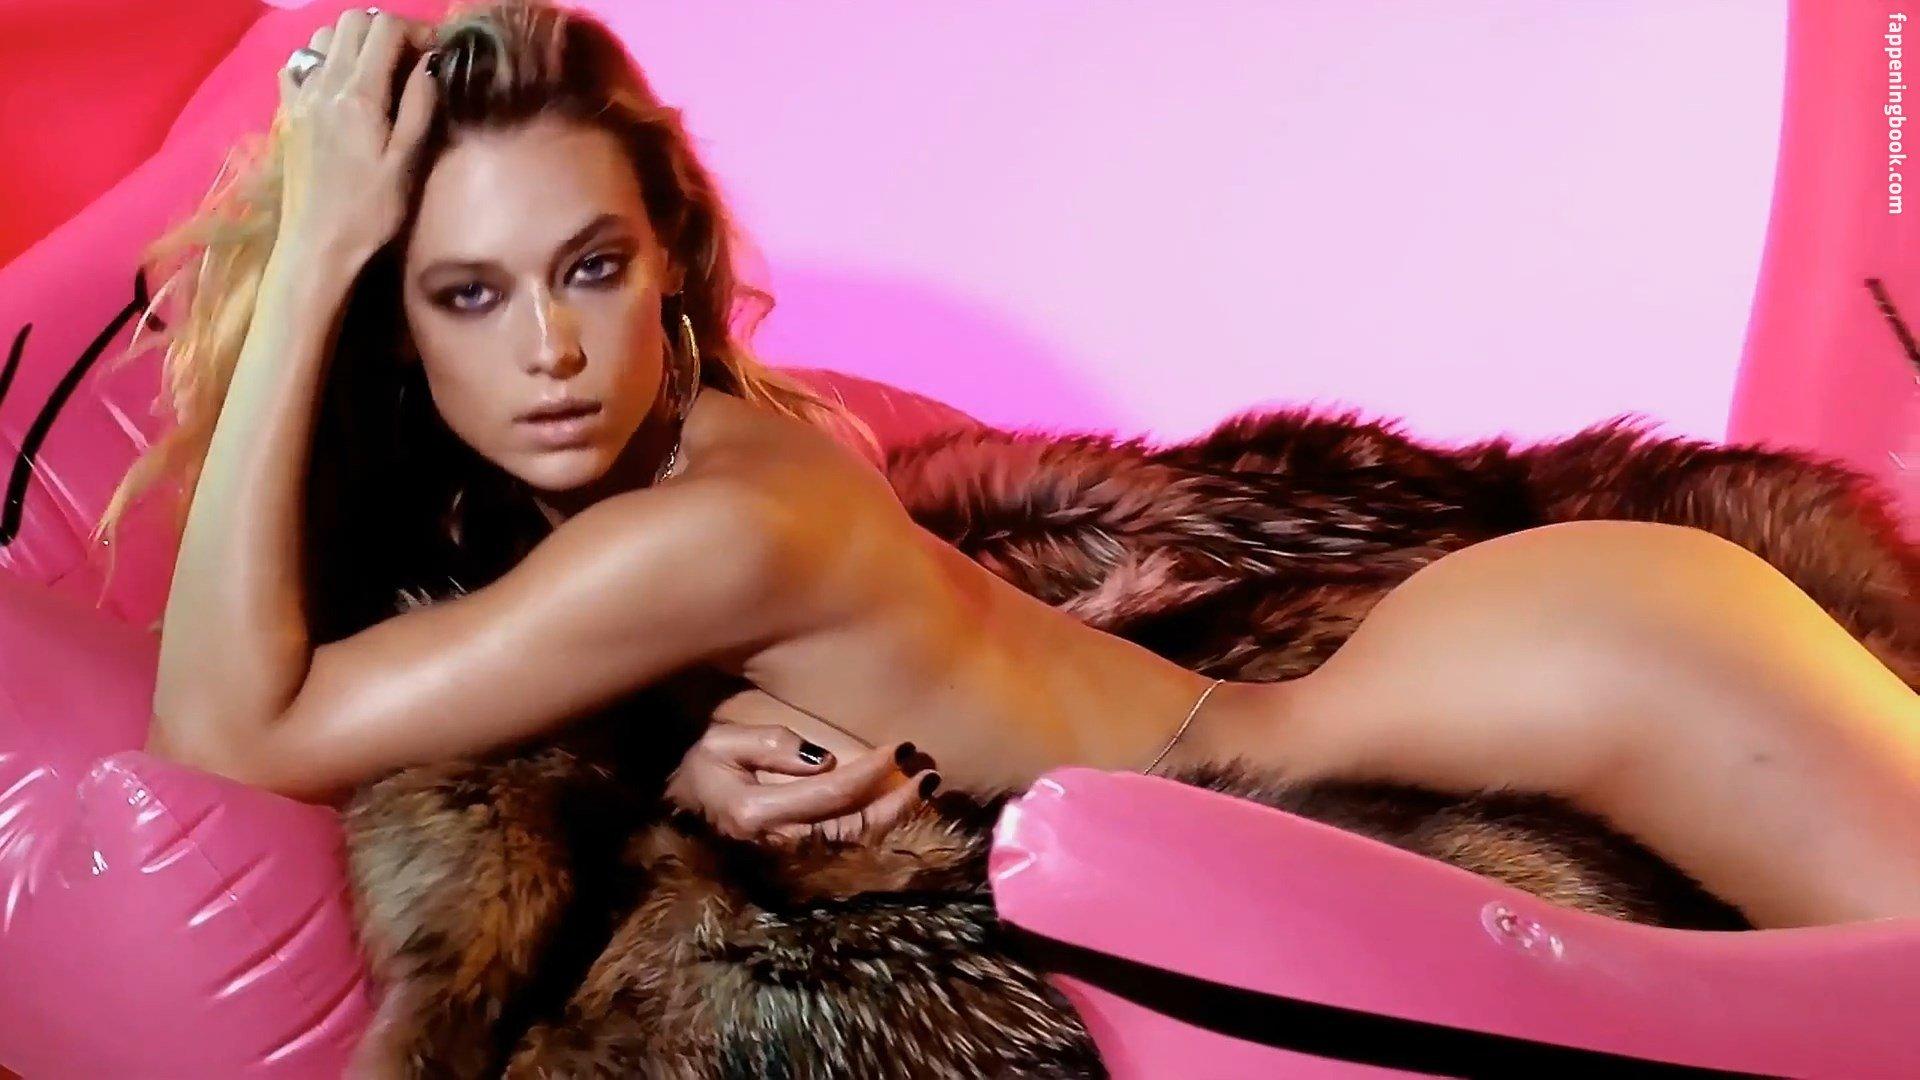 Jana nackt Hachmeister Playboy Magazine